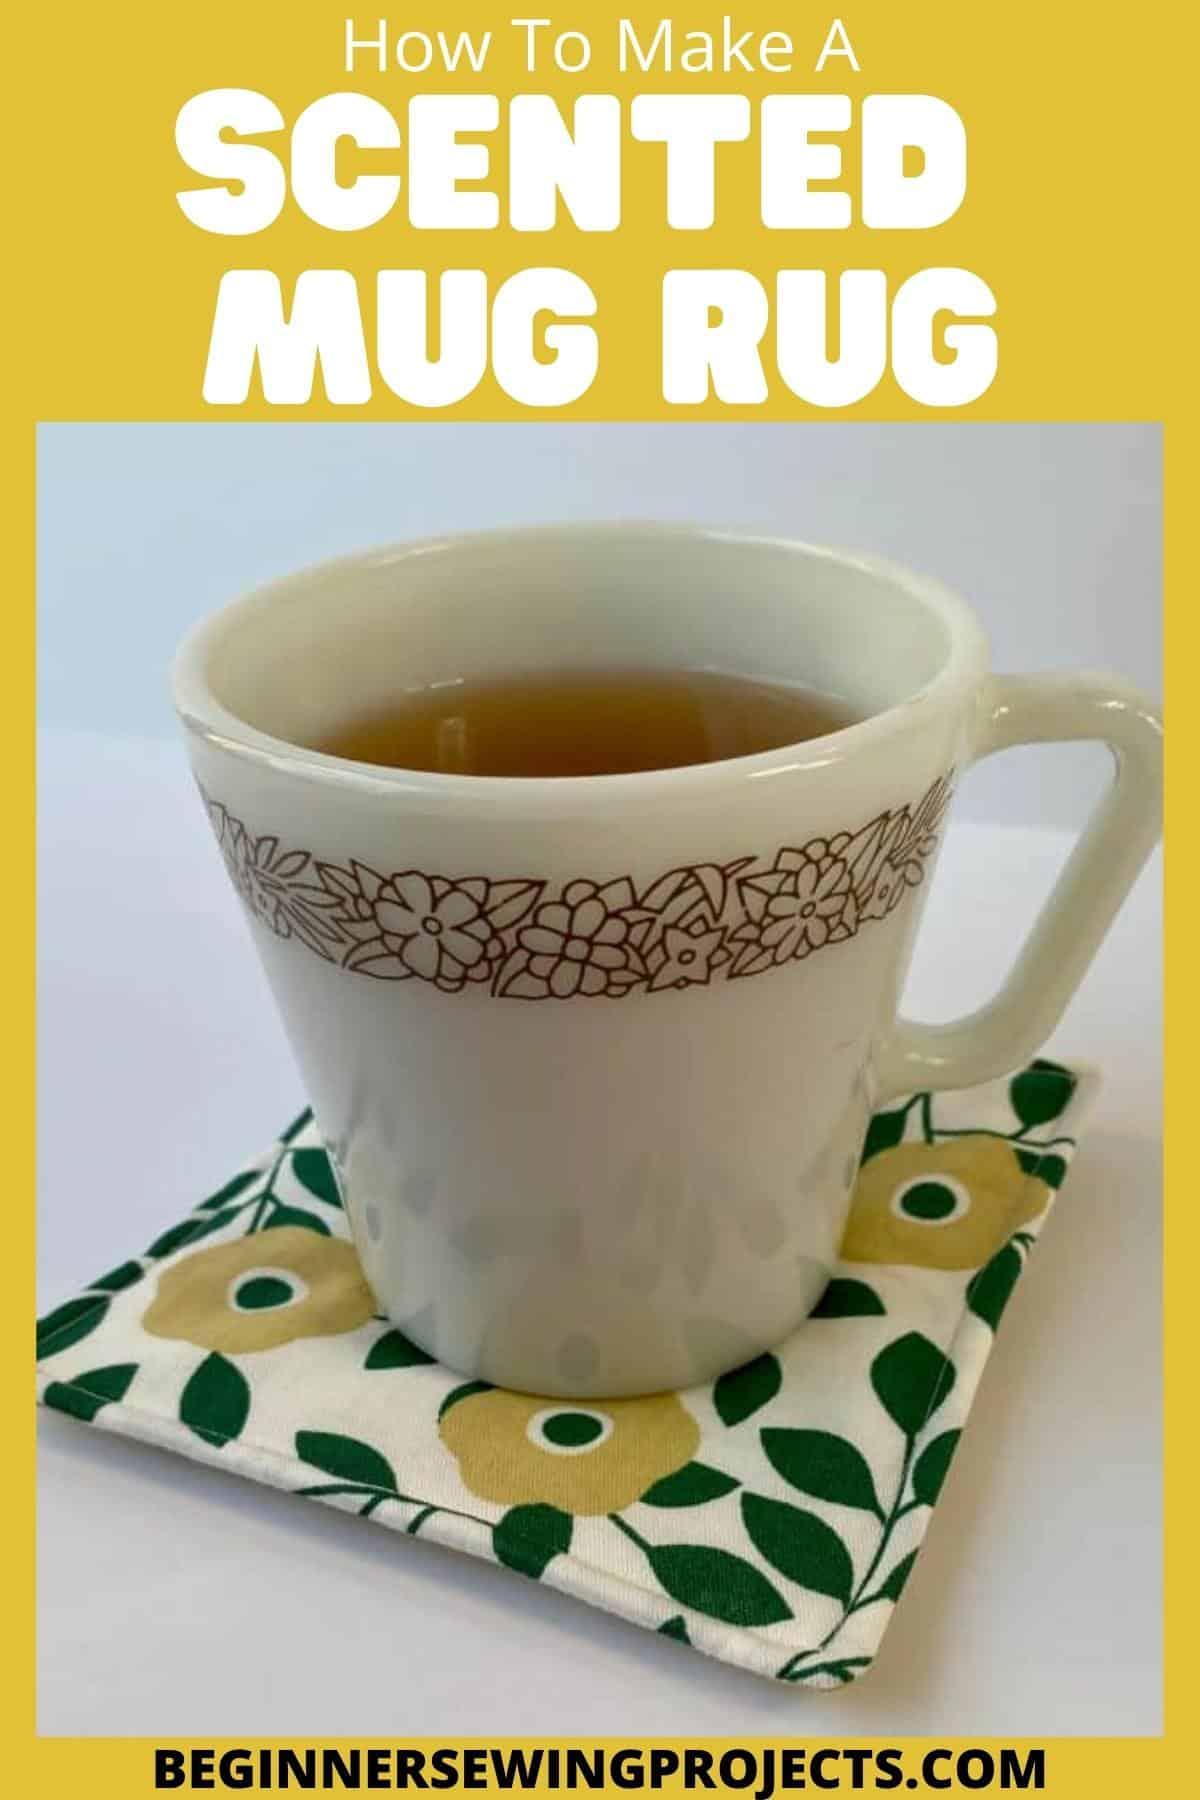 How To Make A Scented Mug Rug